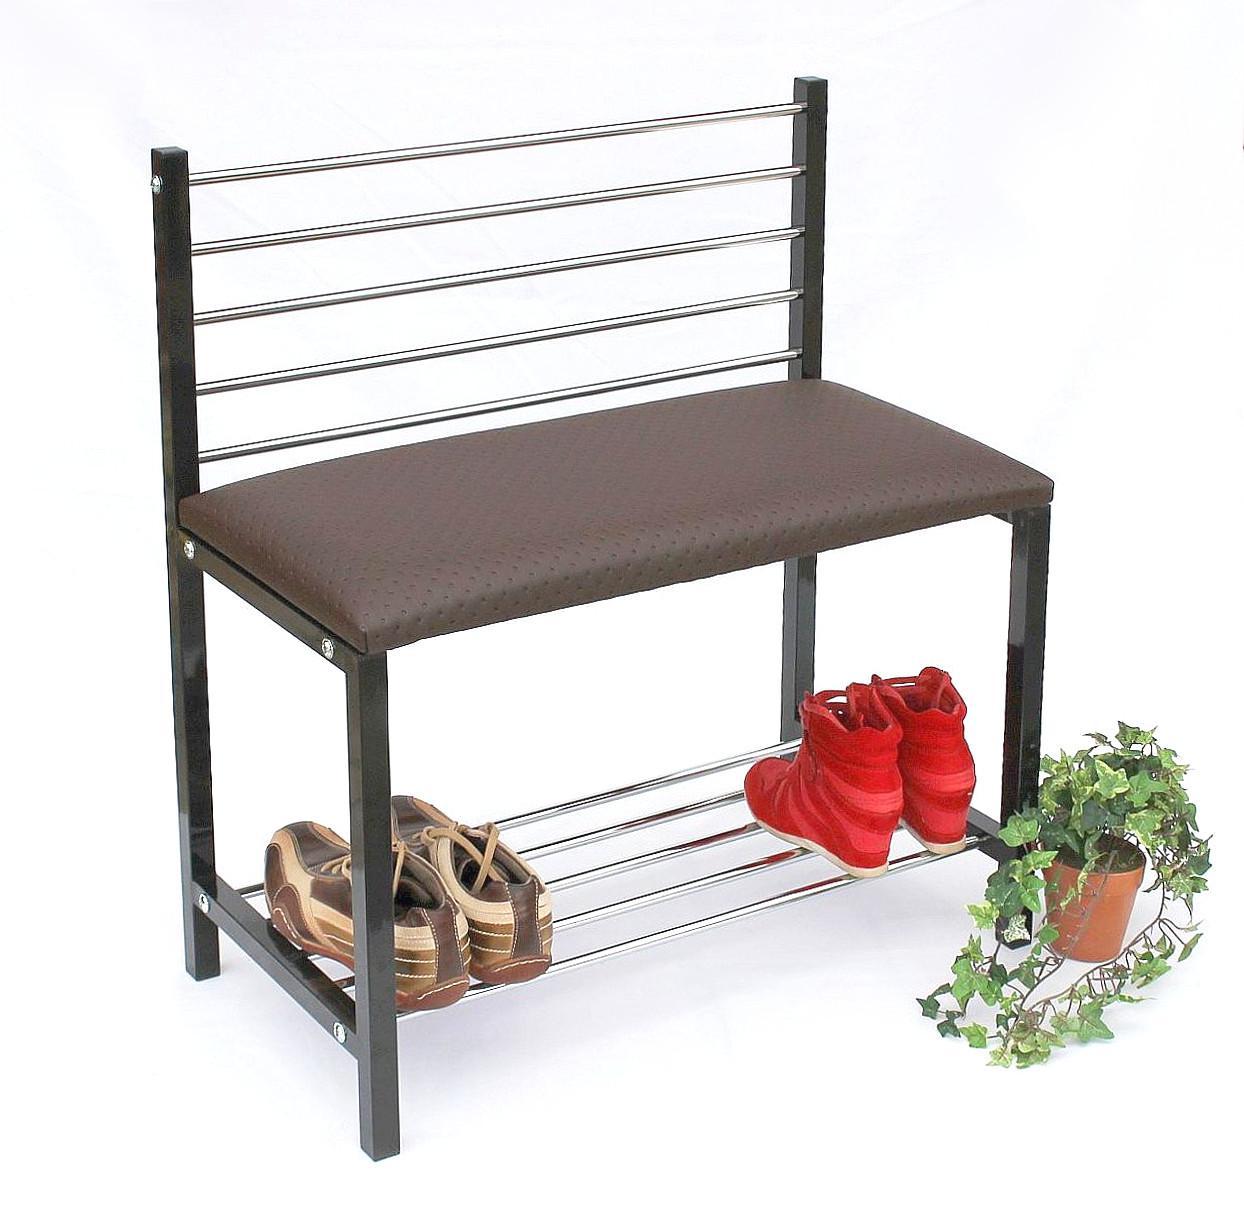 Schuhregal mit Sitzbank Art.392 Bank 70cm Schuhschrank aus Metall ...